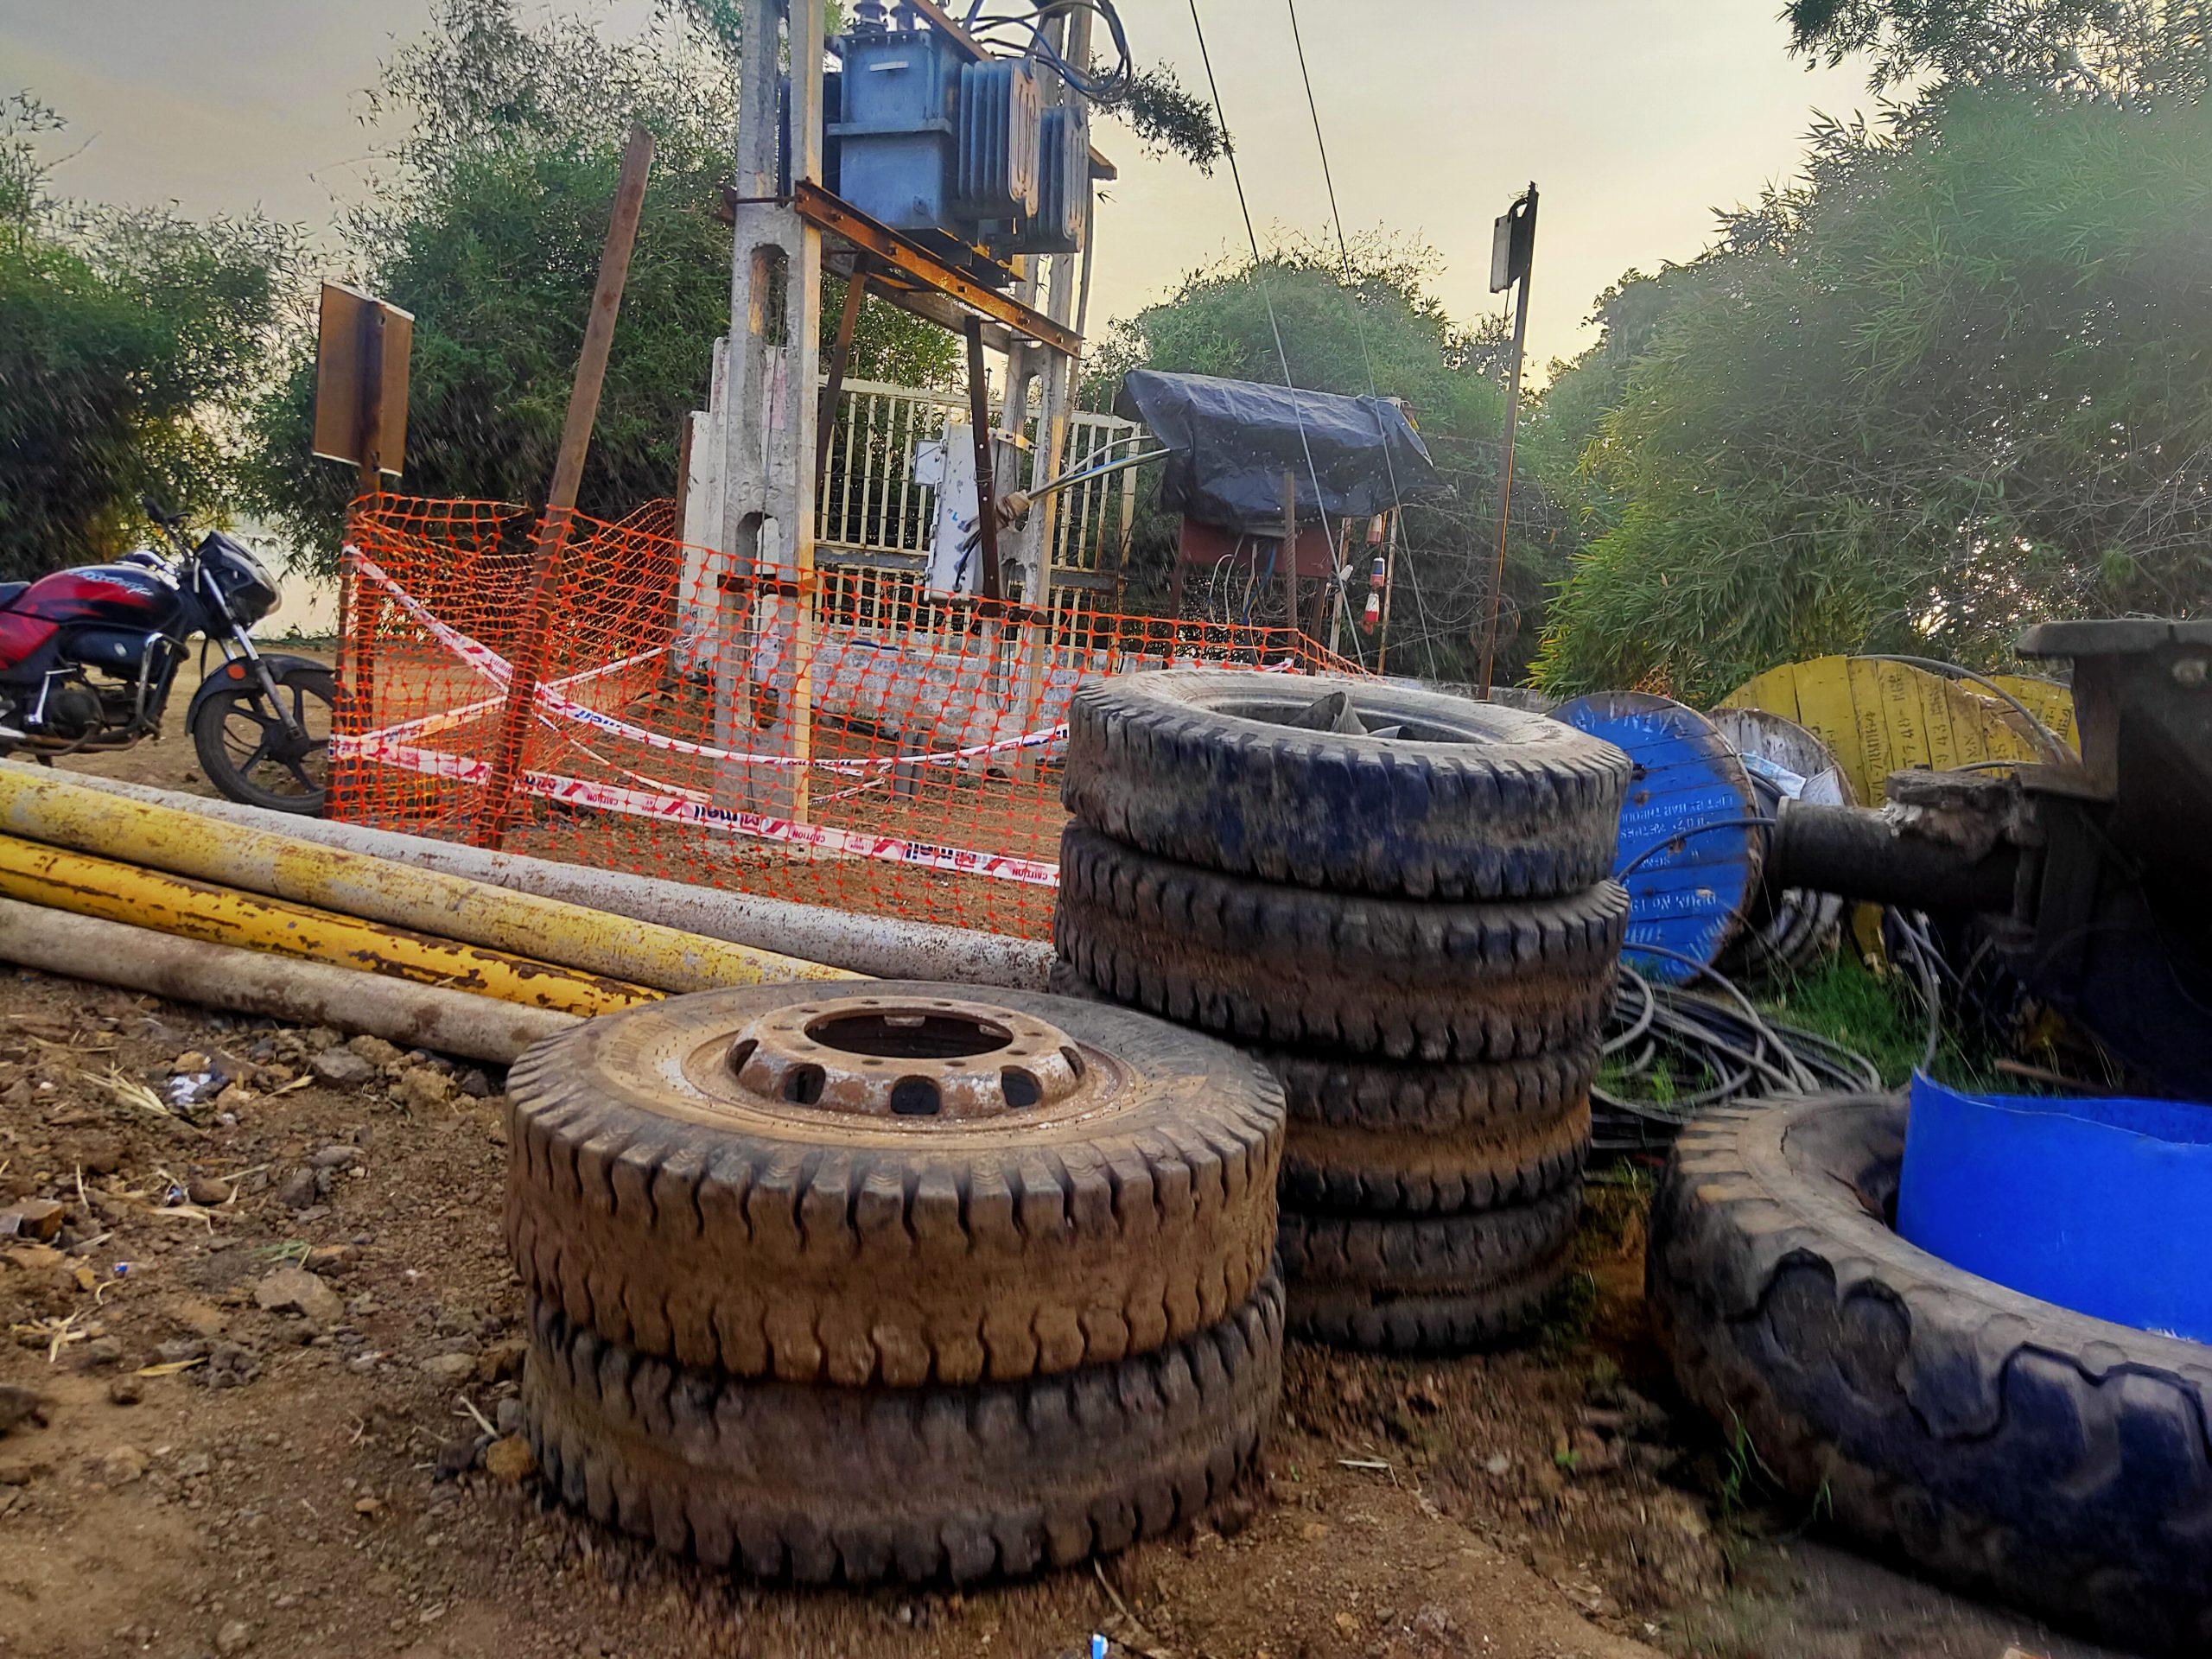 Tyres at a garage